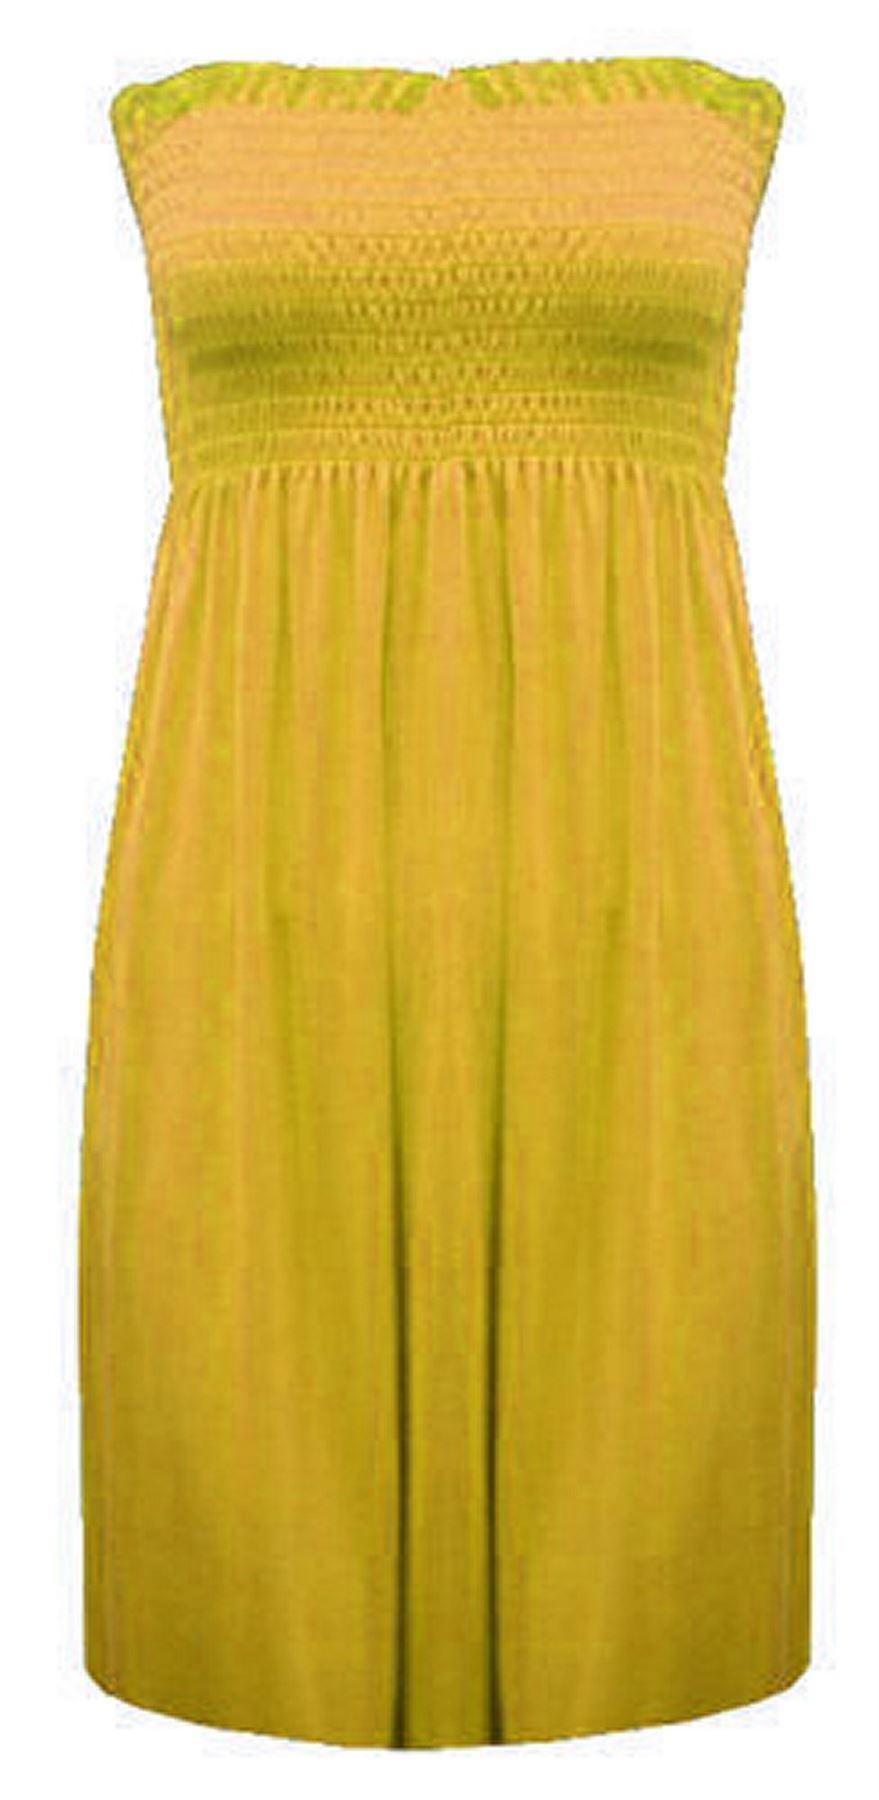 New-Ladies-Bandeau-Boob-Gathering-Tops-Boob-Tube-Beach-Wear-Tunics-8-26 thumbnail 90